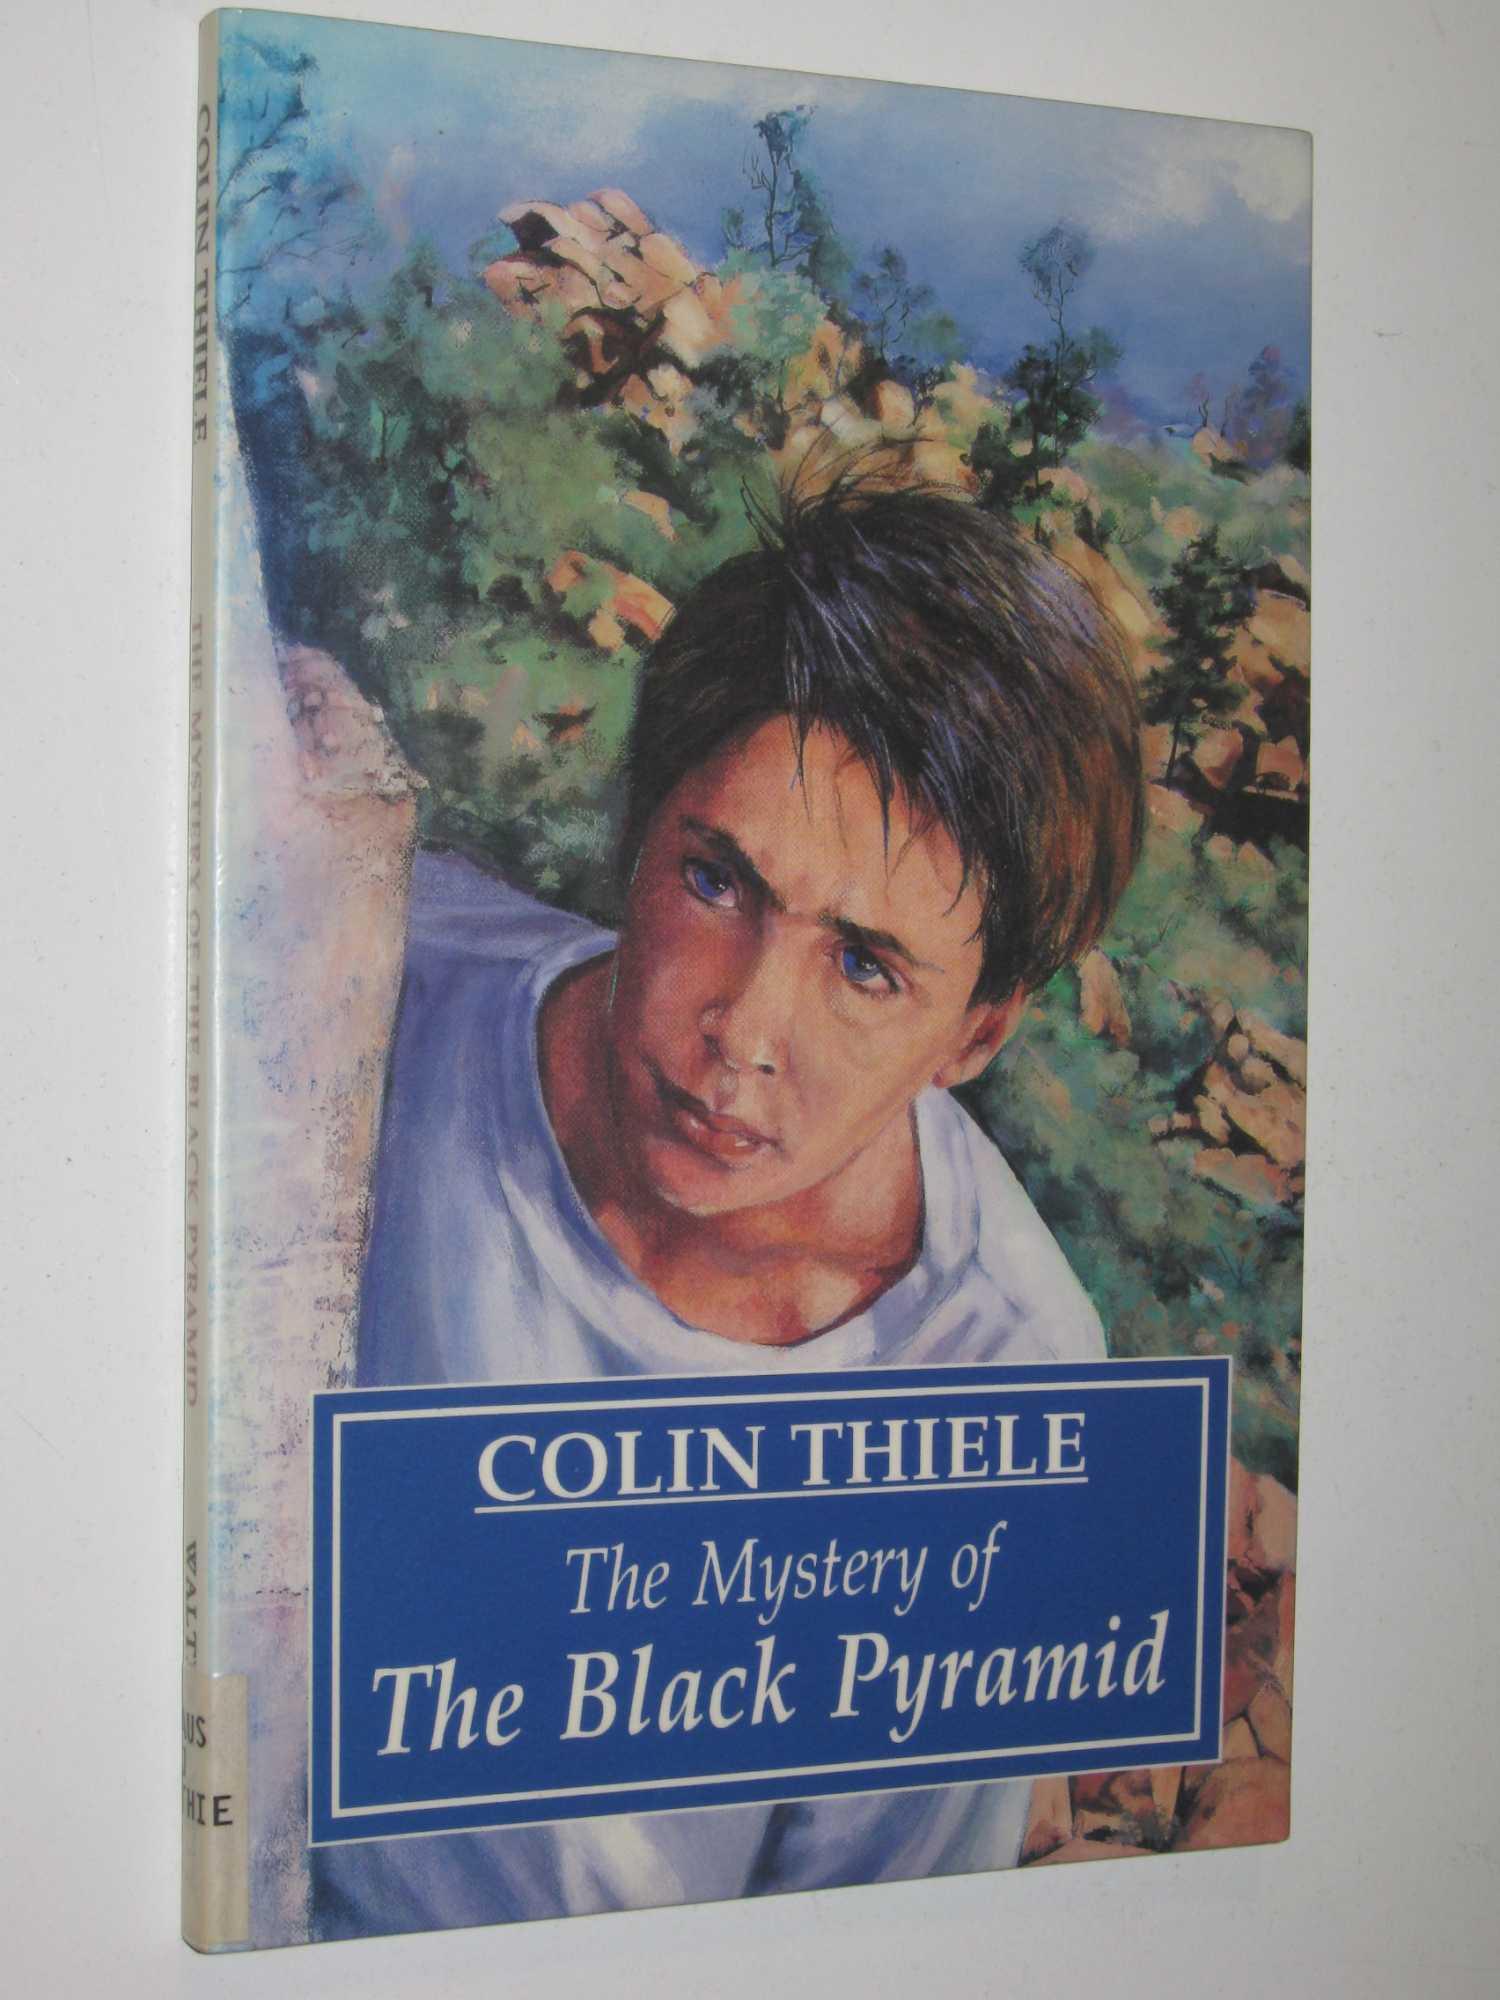 The-Mystery-of-the-Black-Pyramid-by-COLIN-THIELE-1996-1st-ed-Medium-PB